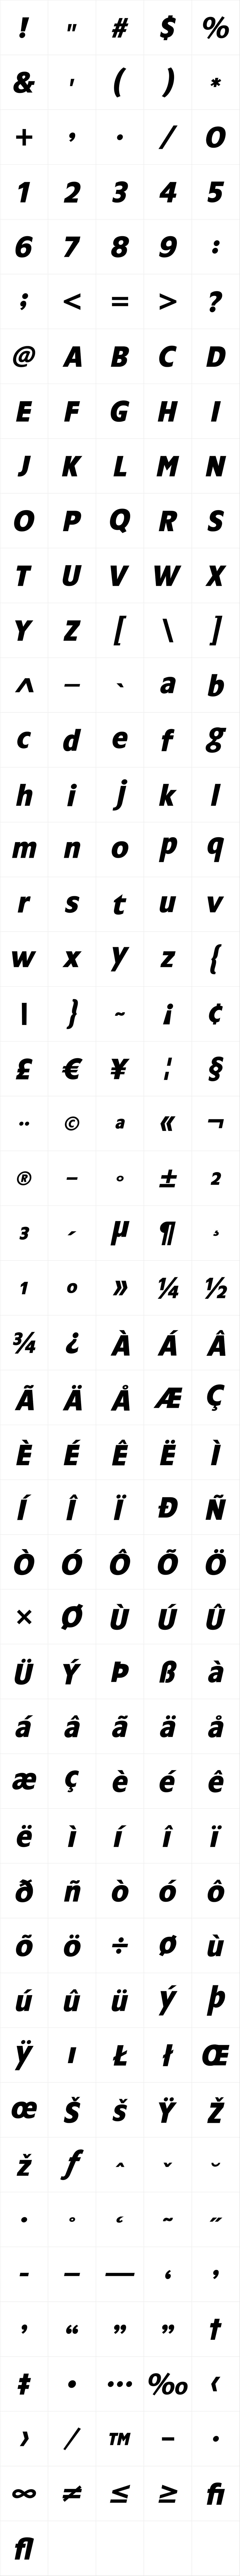 Chalfont Bold Italic